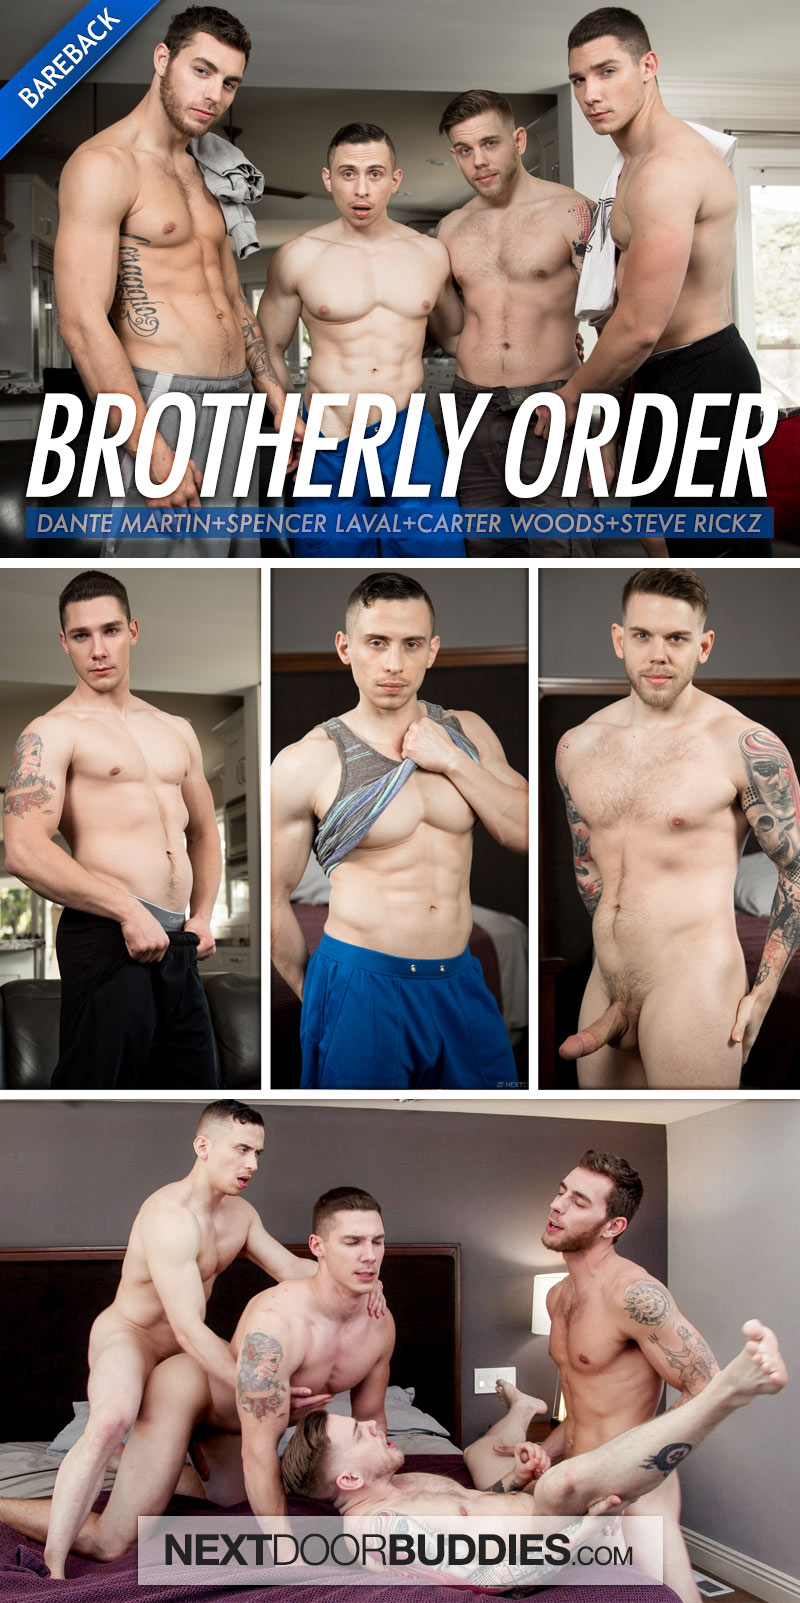 Brotherly Order (Dante Martin, Spencer Laval, Carter Woods and Steve Rickz) (Bareback) at Next Door Buddies